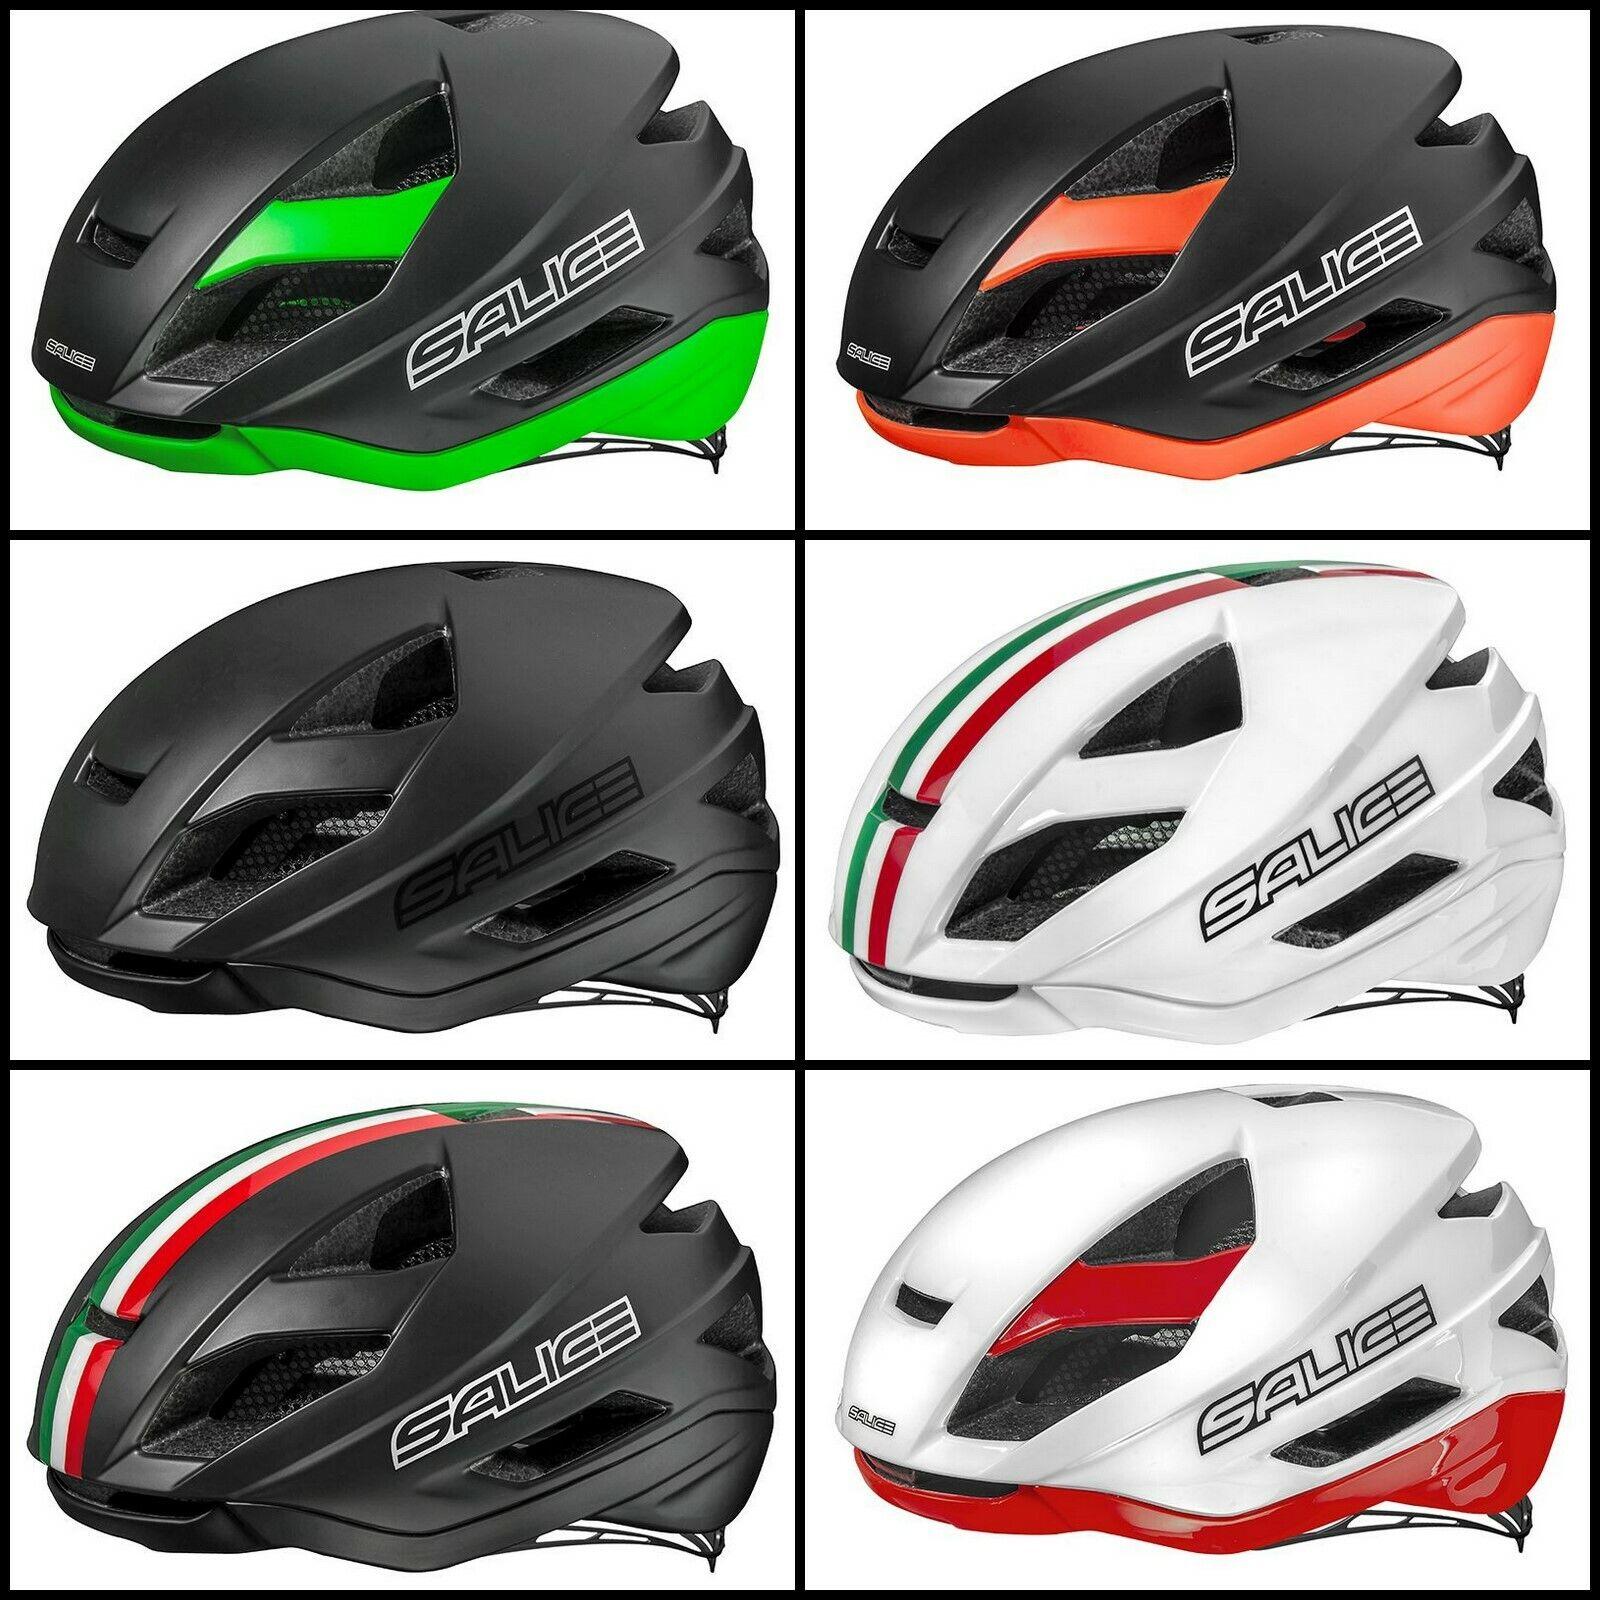 SALICE casco bici corsa ciclismo bike helmet triColoreeee italy LEVANTE road AERO